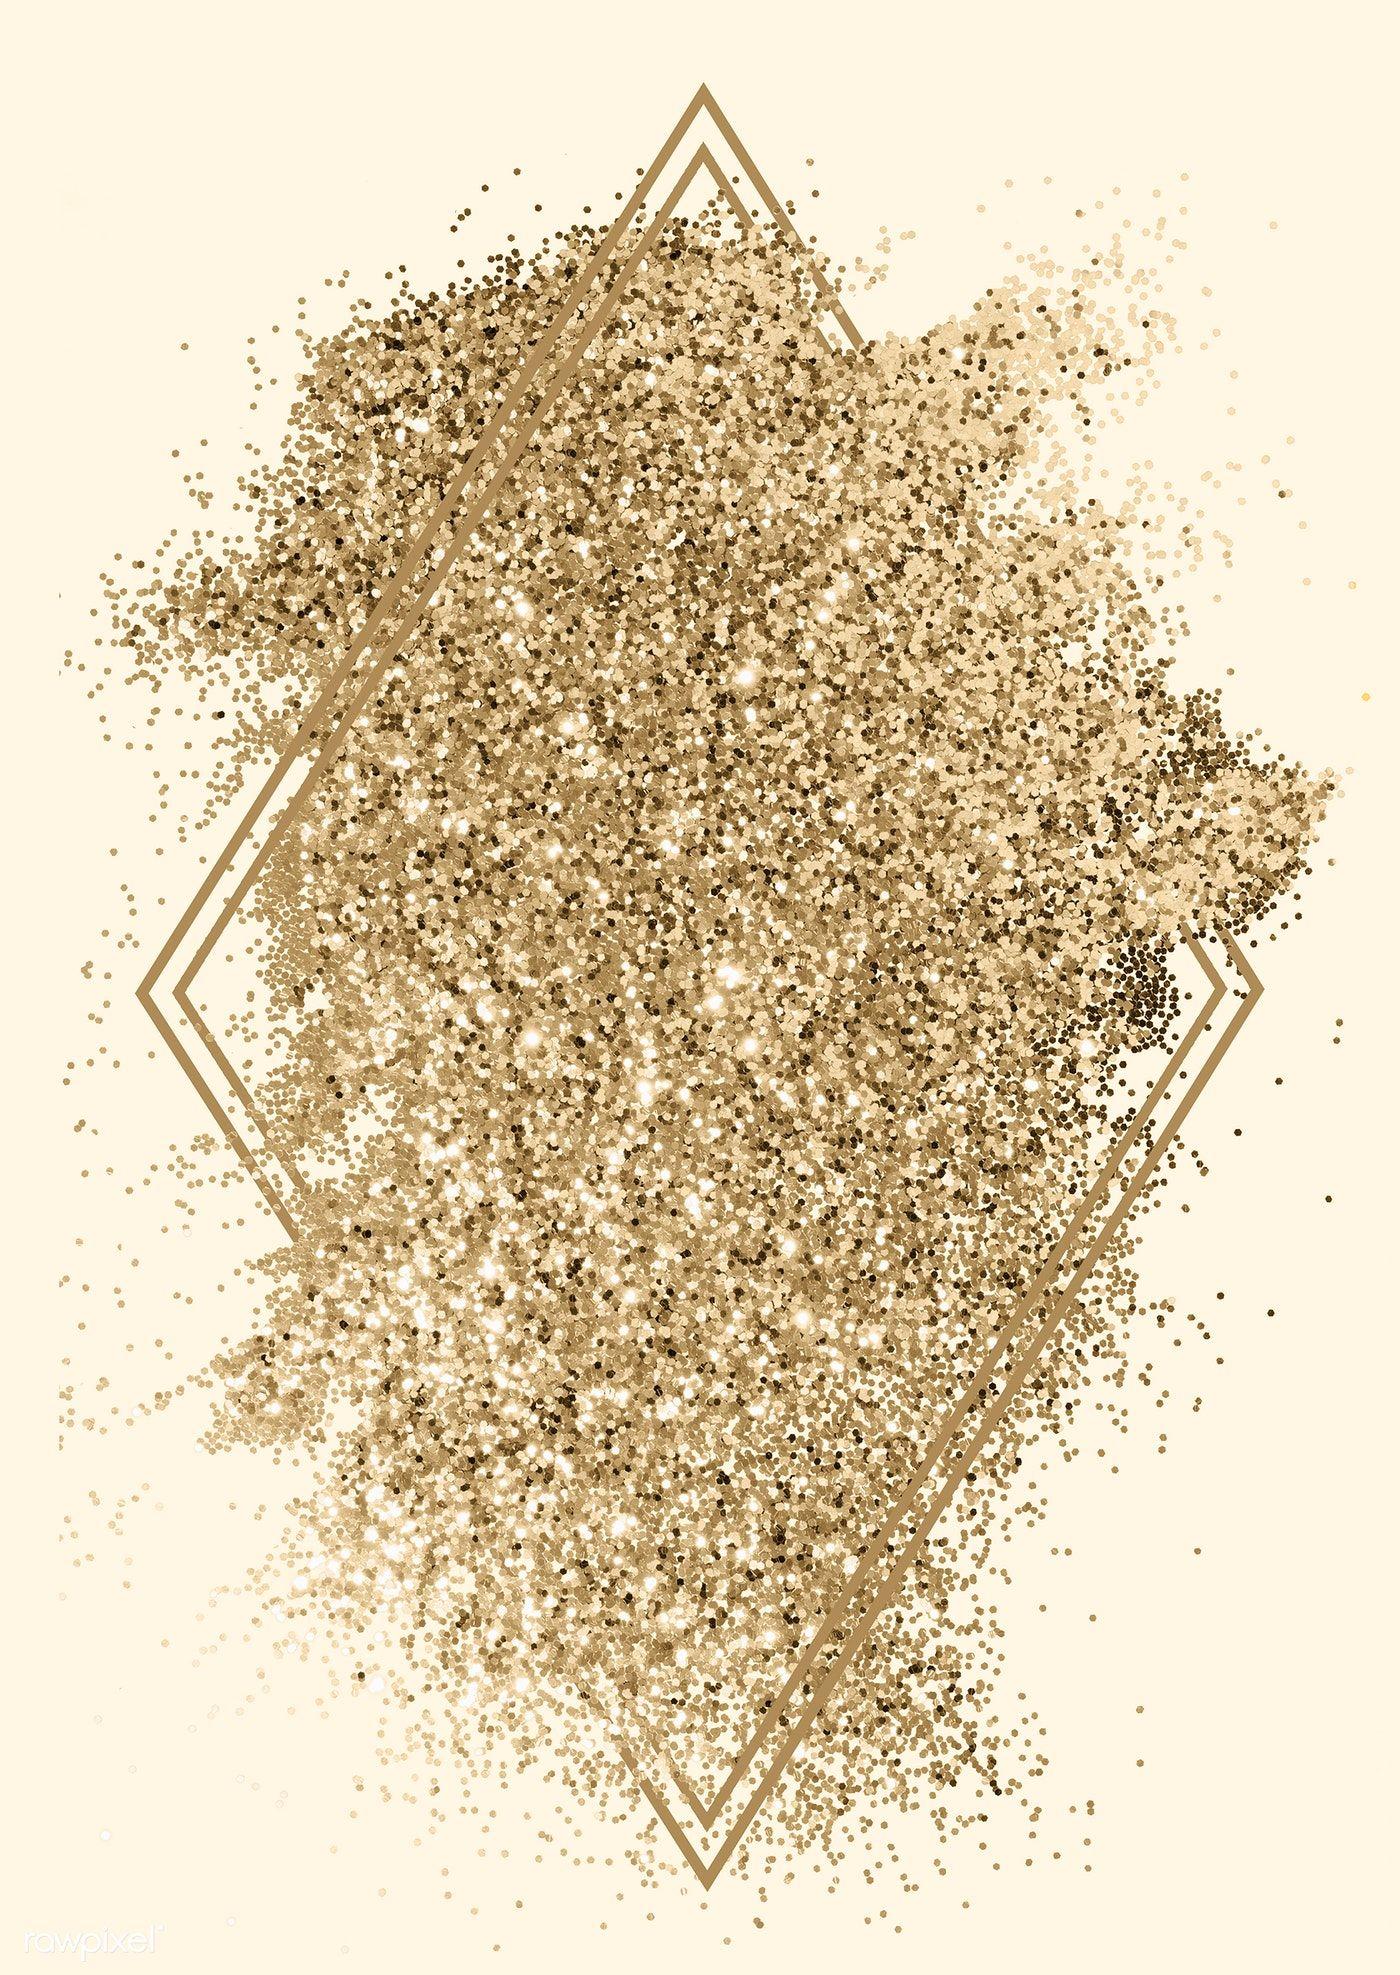 Festive sparkly golden glitter background badge | free image by rawpixel.com / Ake #goldglitterbackground